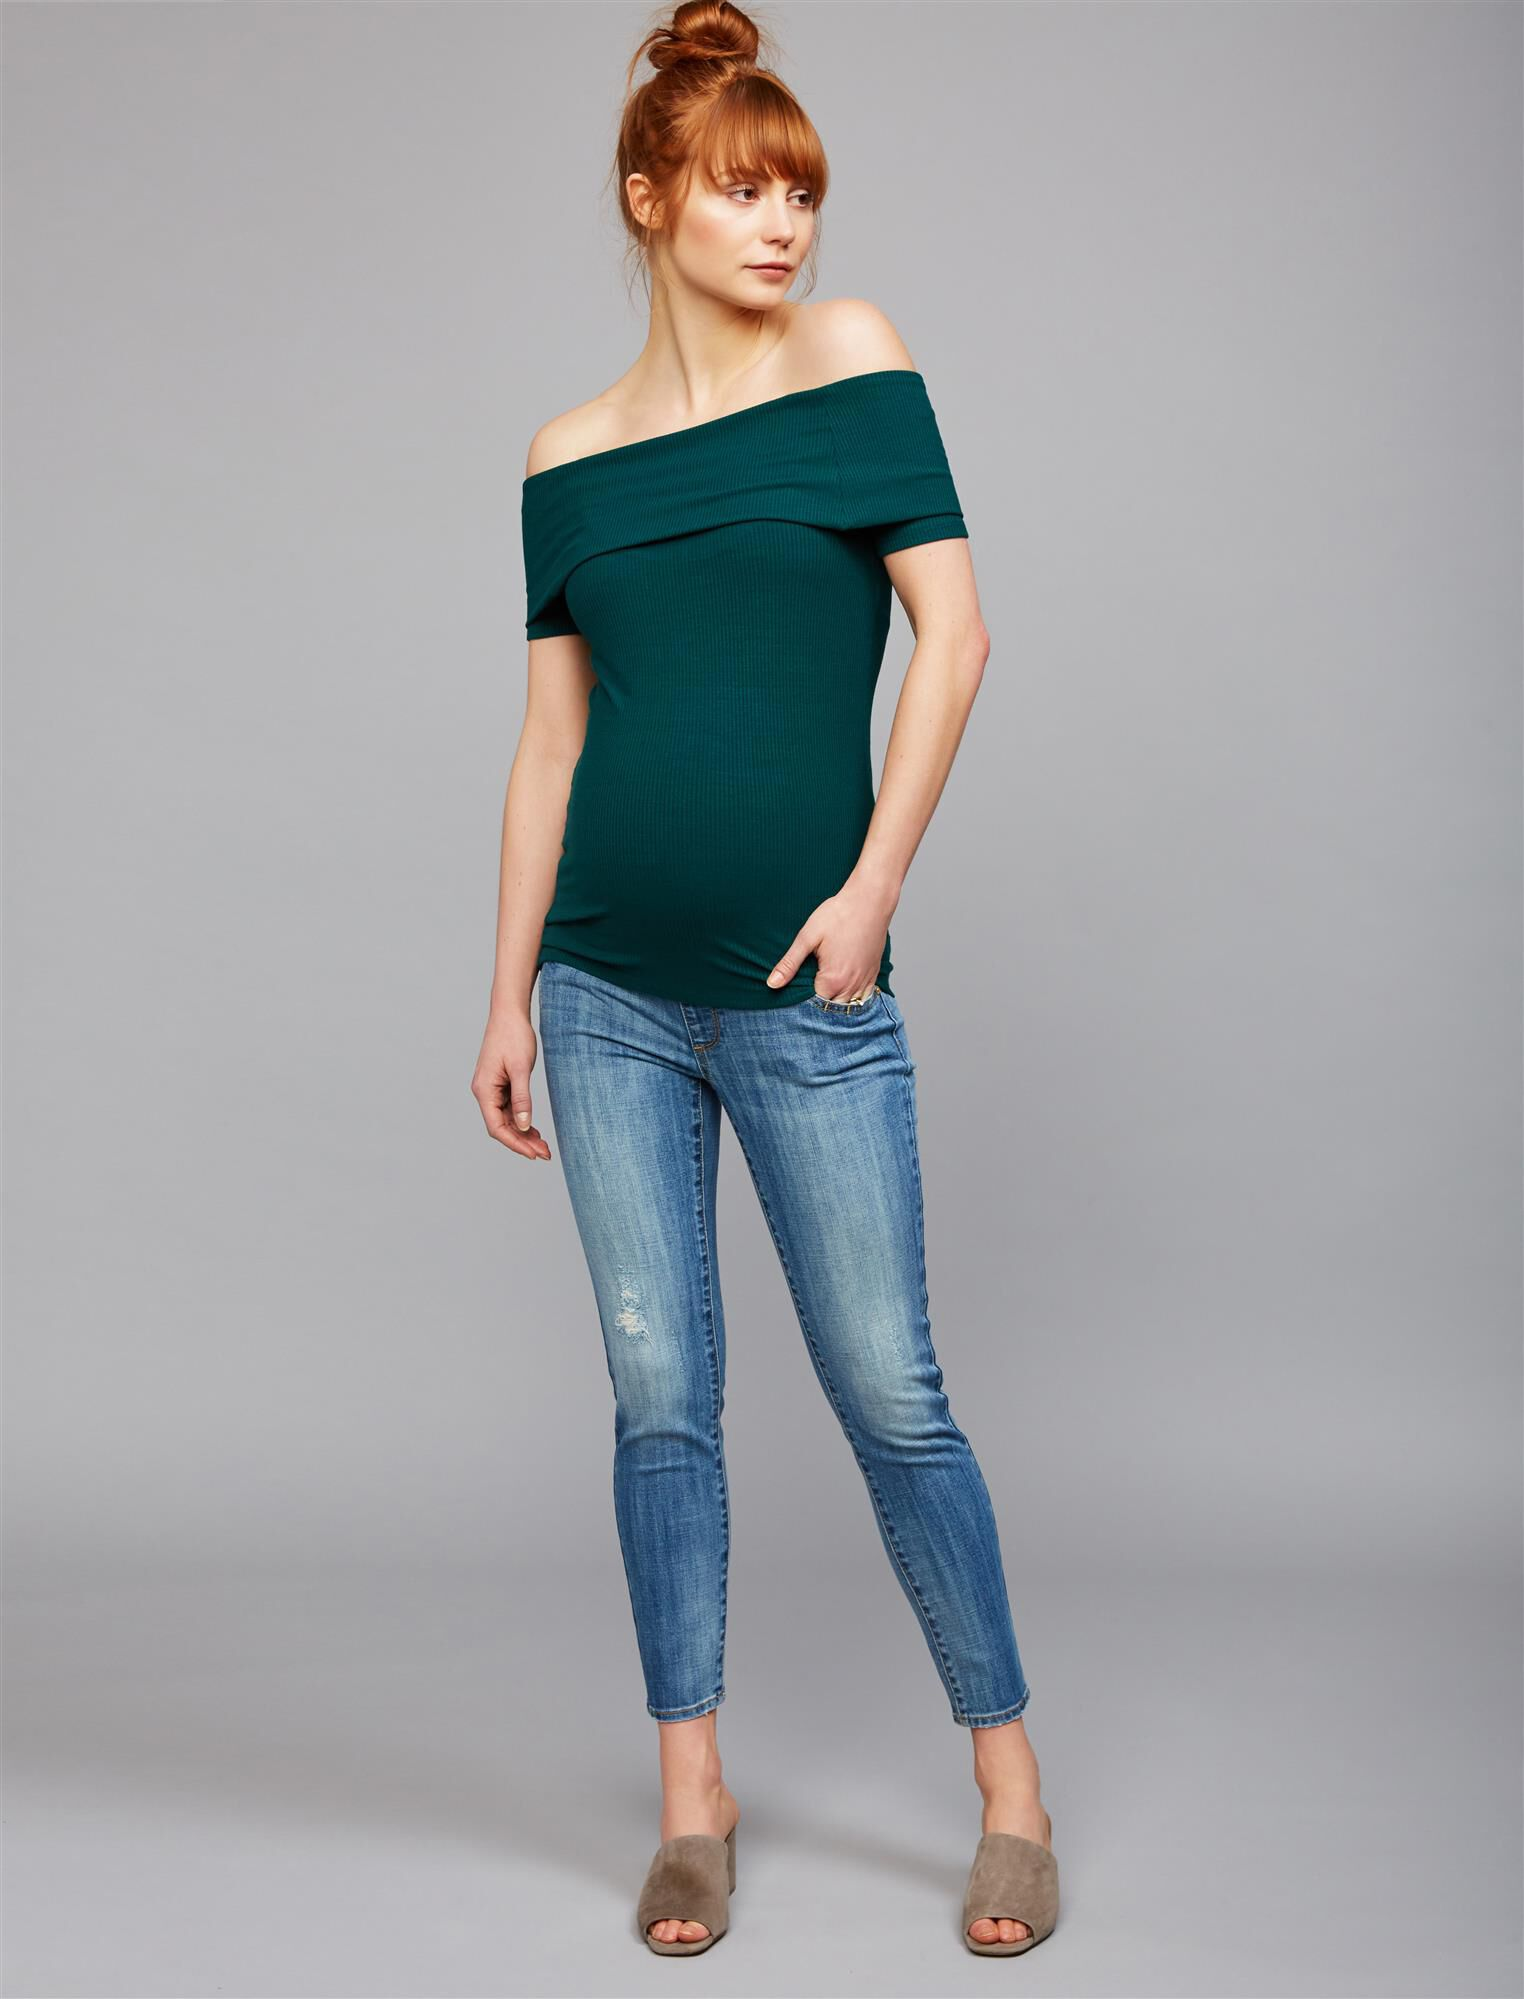 Luxe Essentials Denim Secret Fit Belly Addison Maternity Jeans